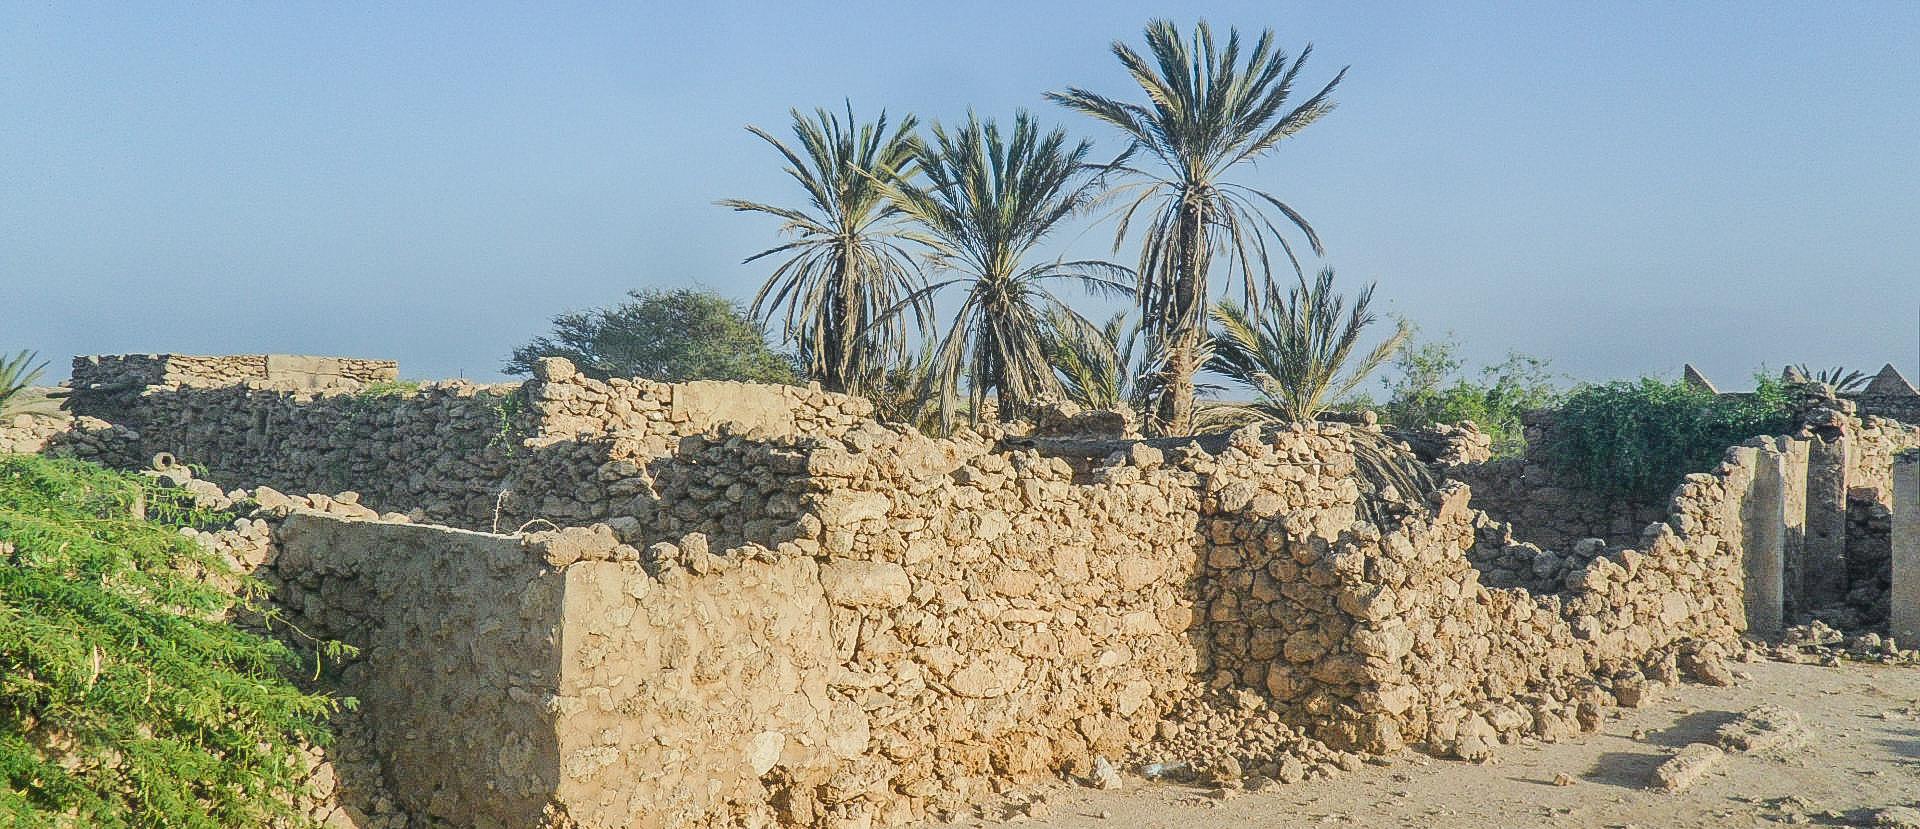 Al-Qassar village in Farasan Al-Kebir (photo: Florent Egal)